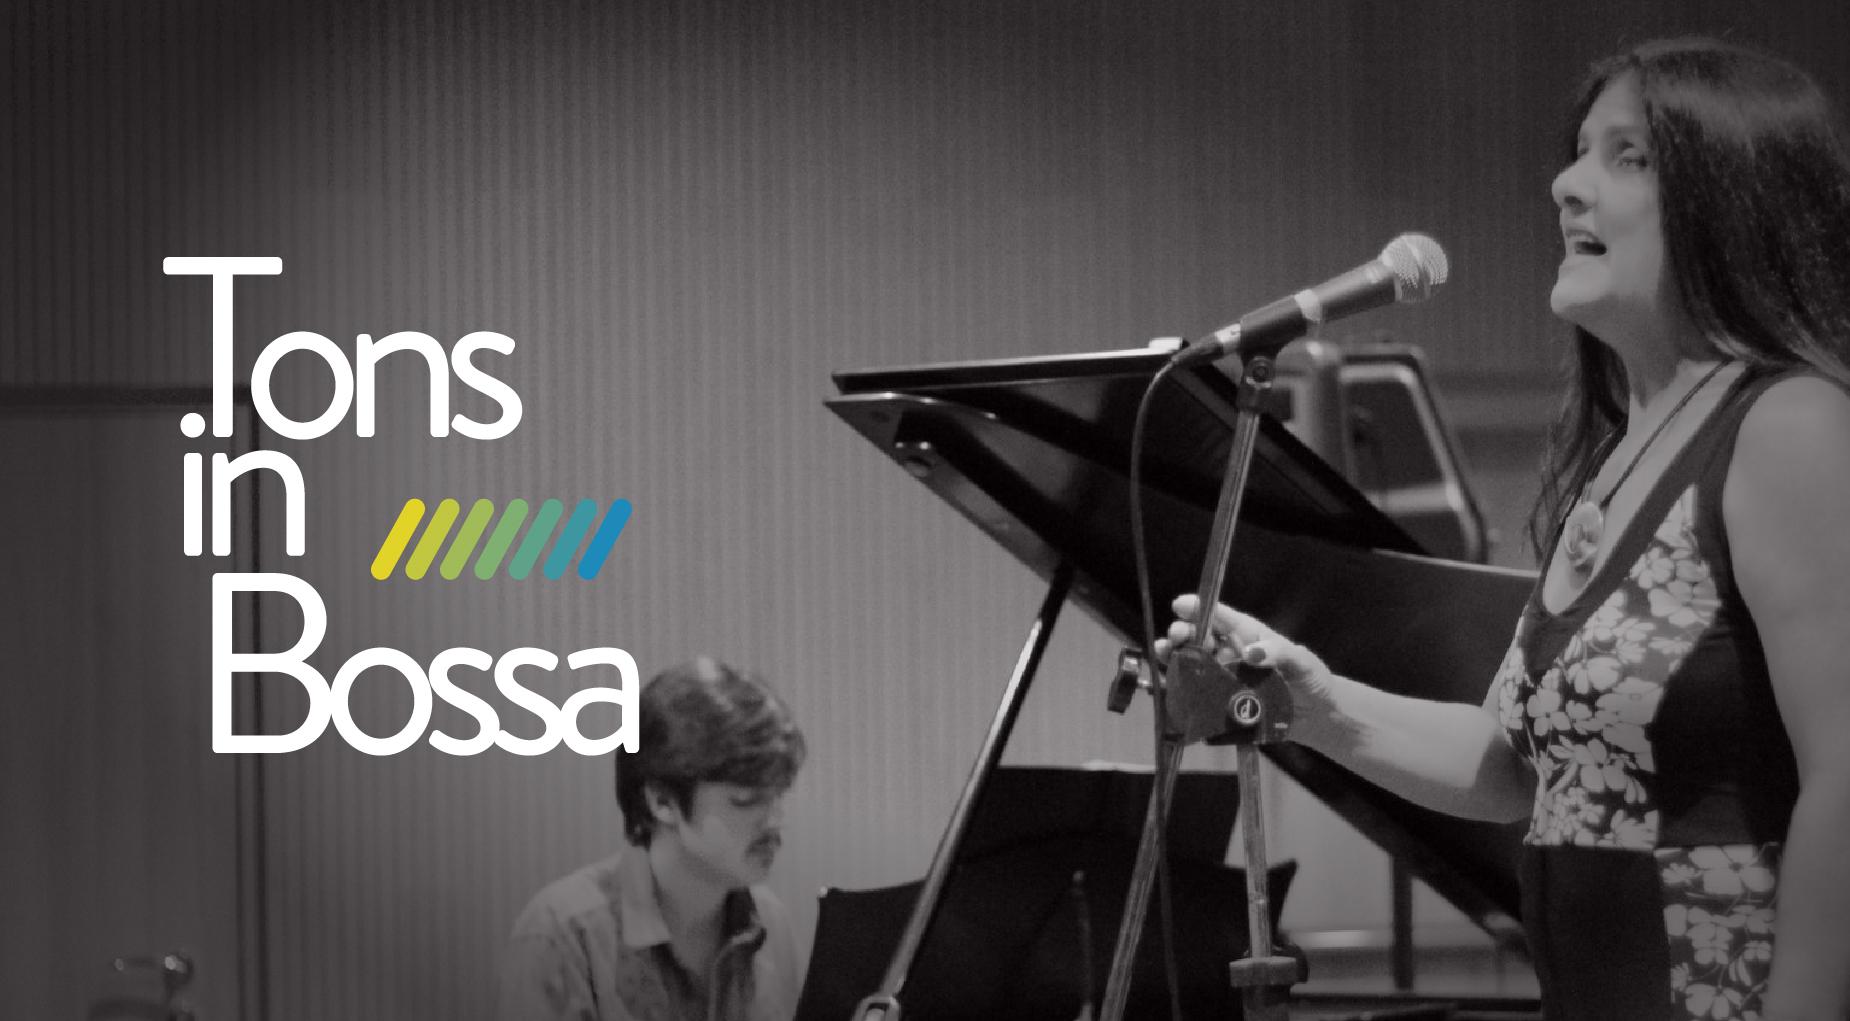 23/06 - tons in bossa: agenda cordas